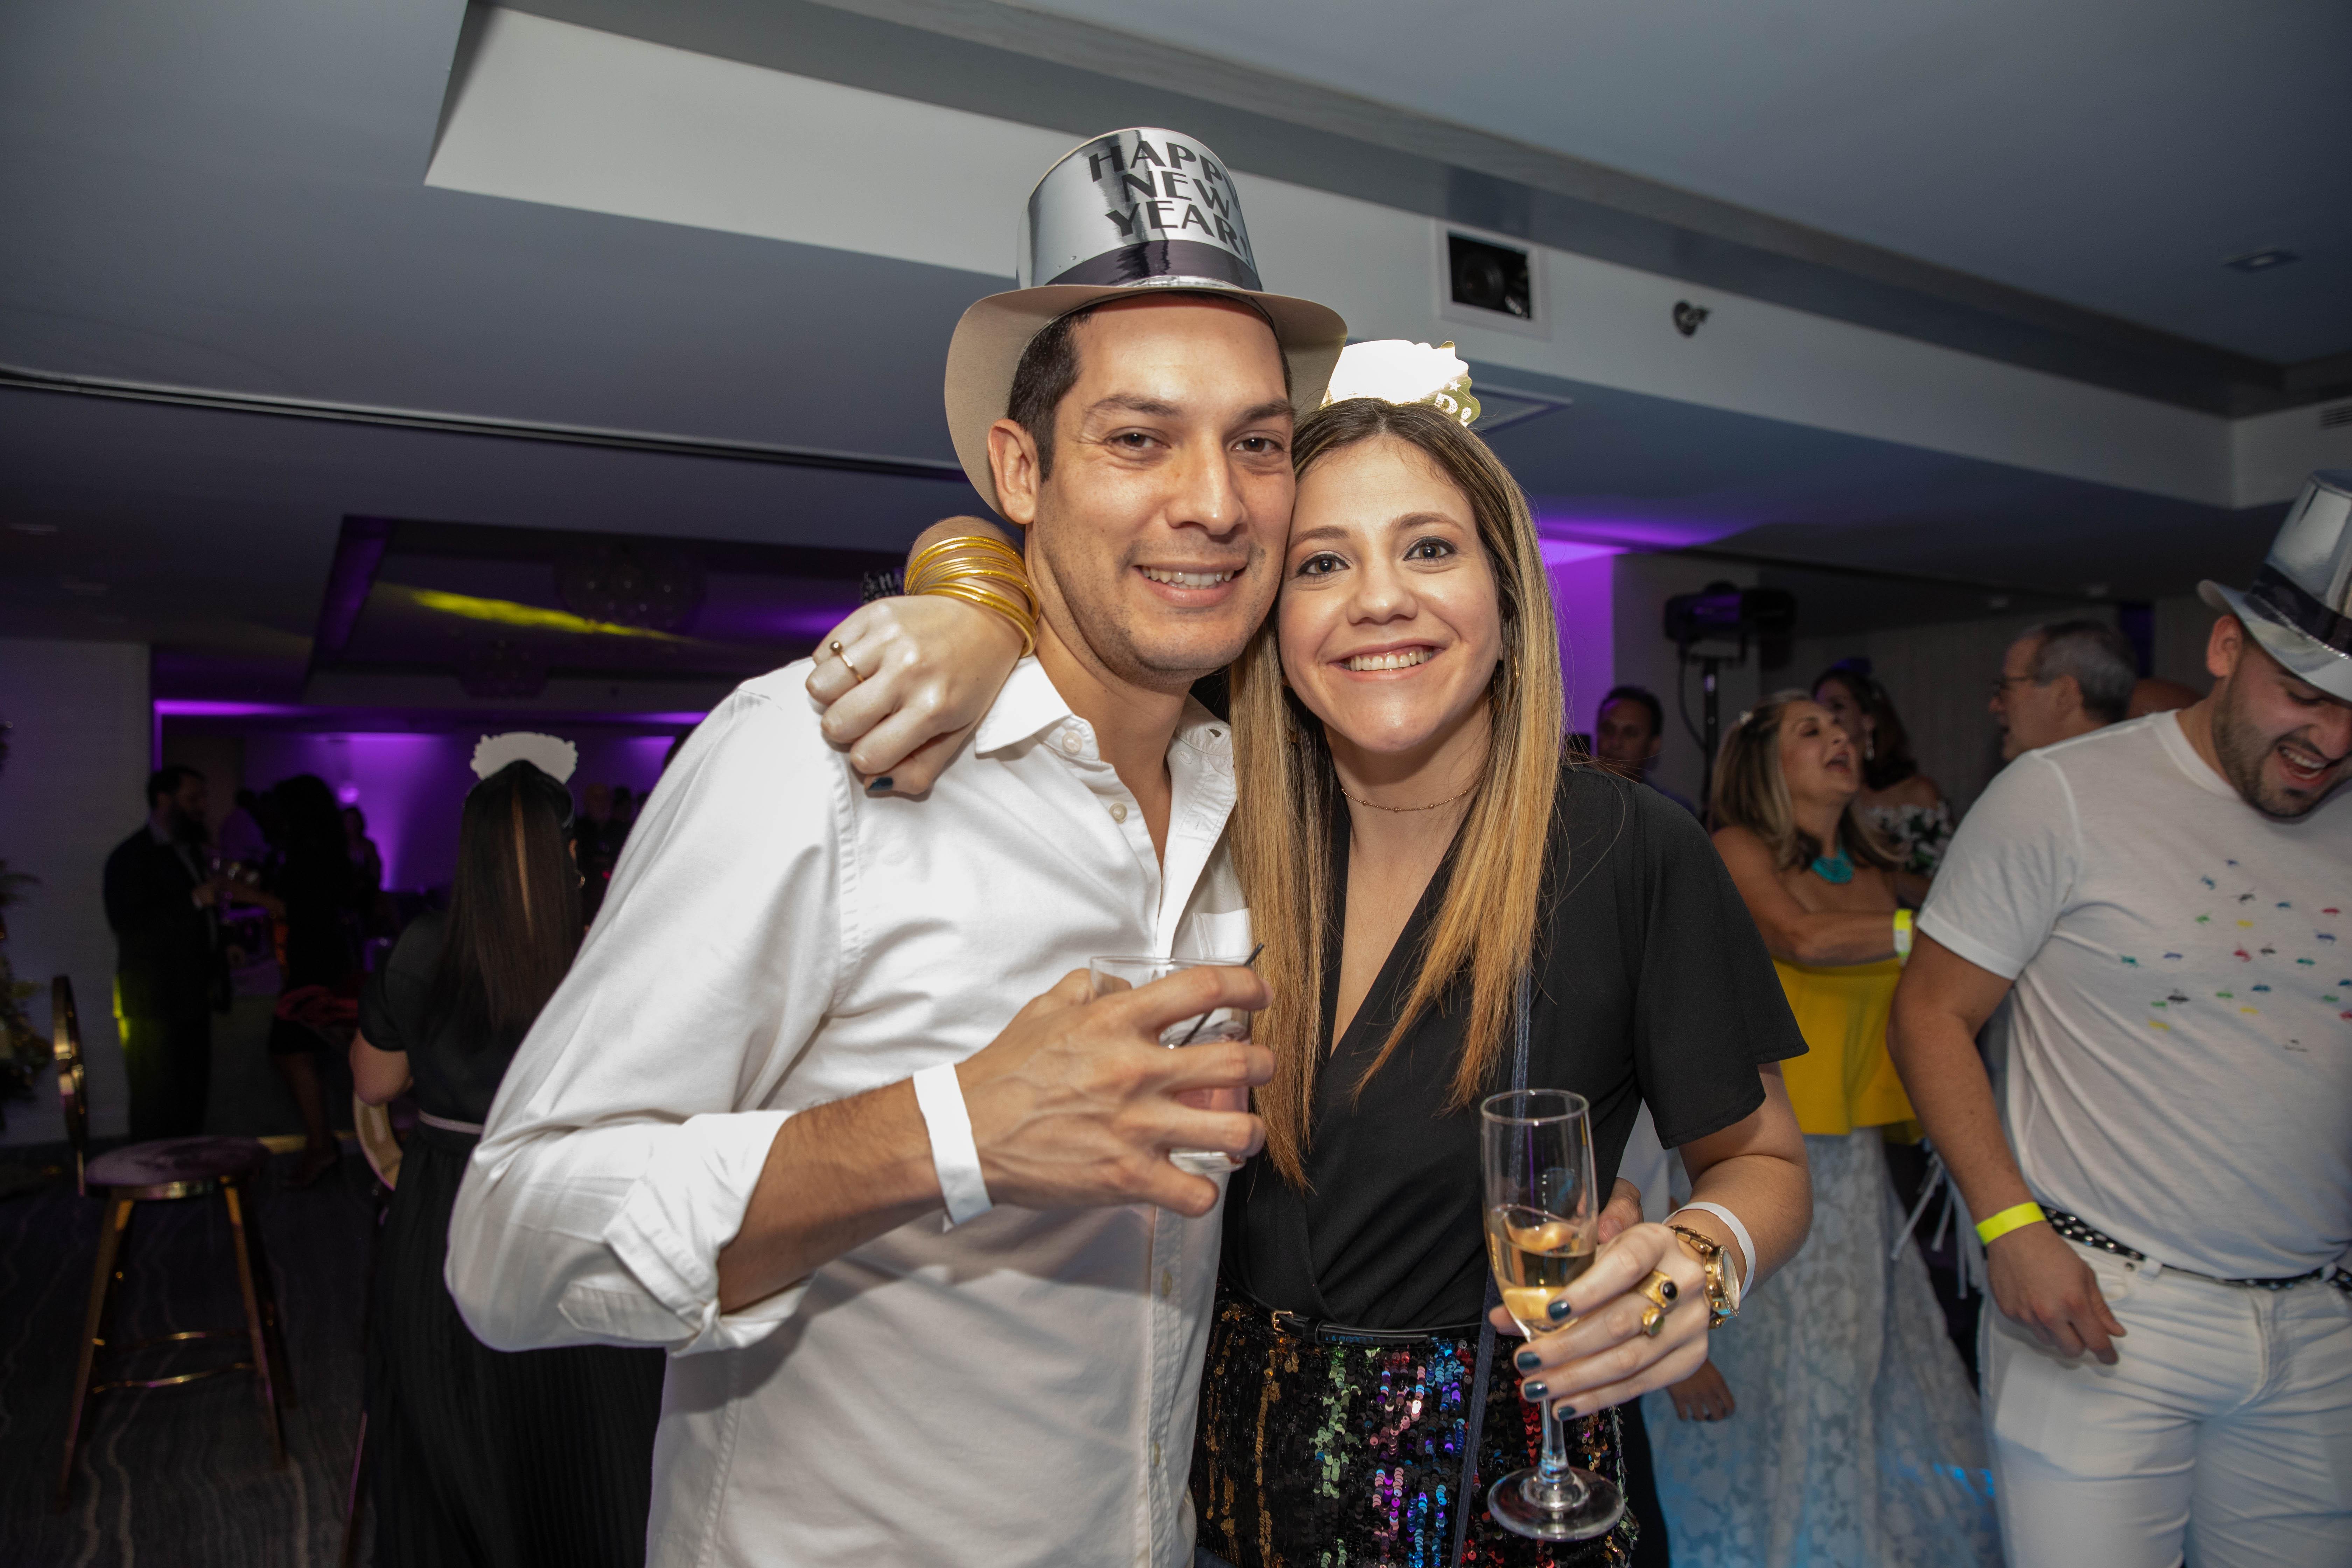 Santiago López e Imari Martinez. (Suministrada)